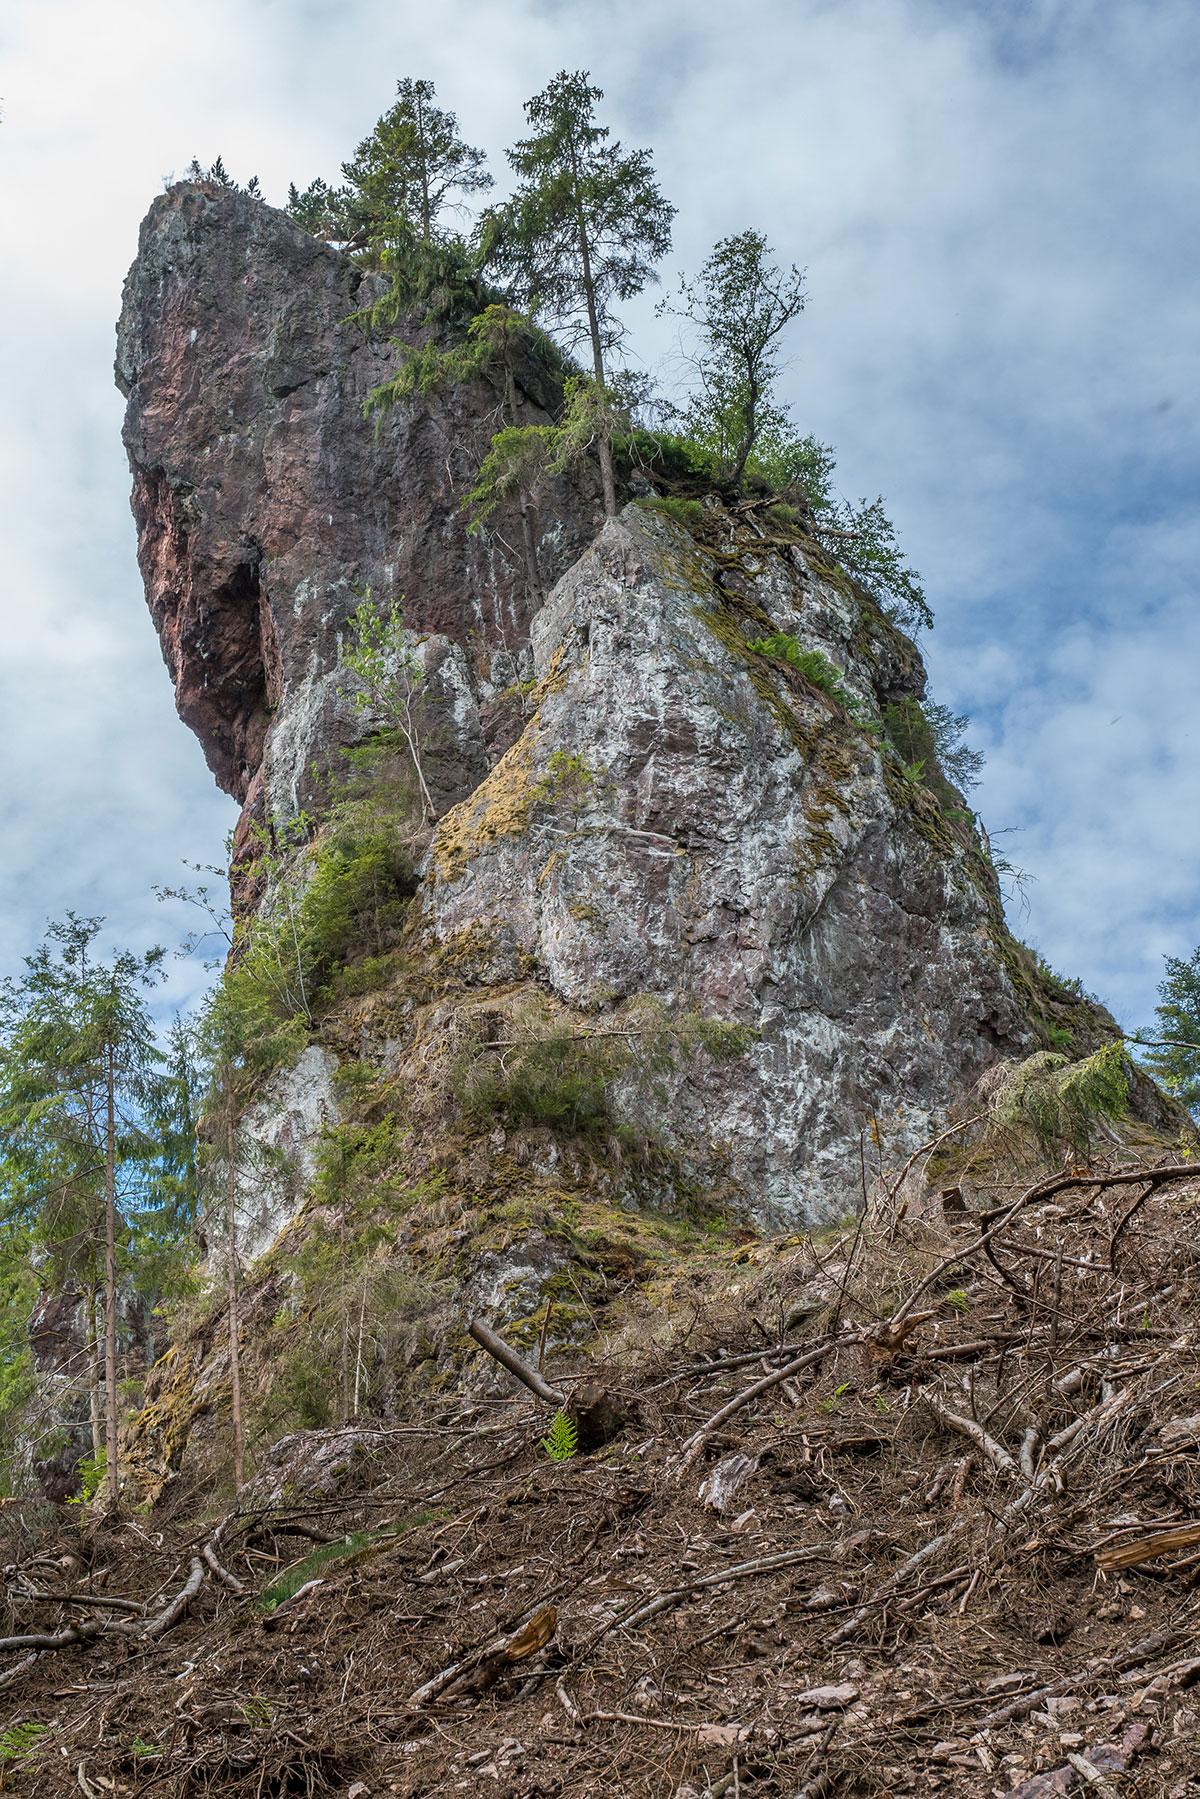 Thüringer Wald, Habichtskopf